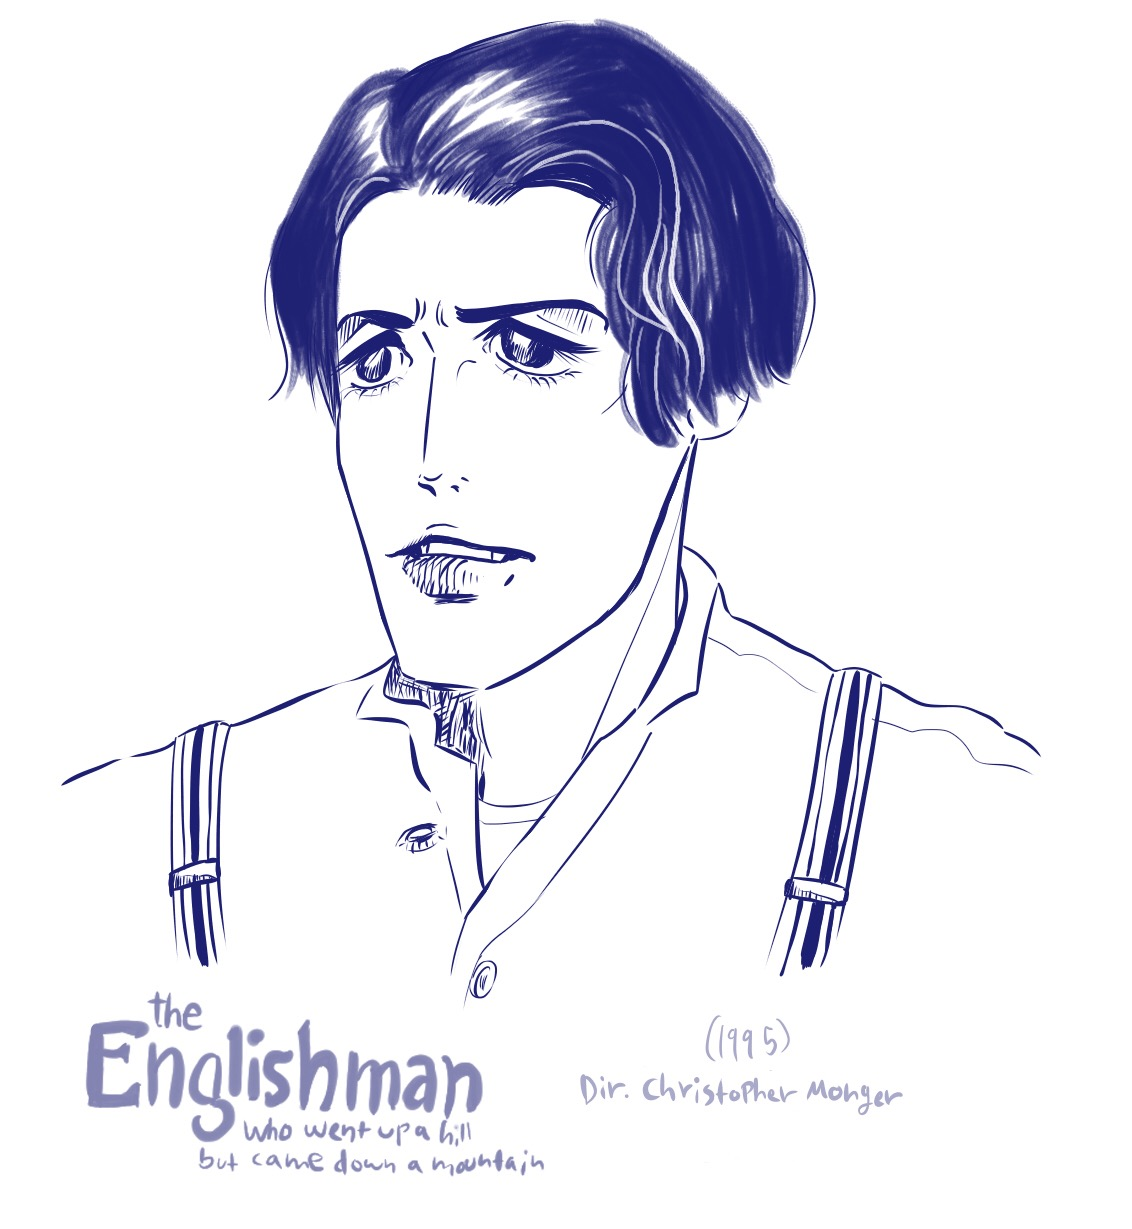 hugh-grant-the-englishman-who.jpg